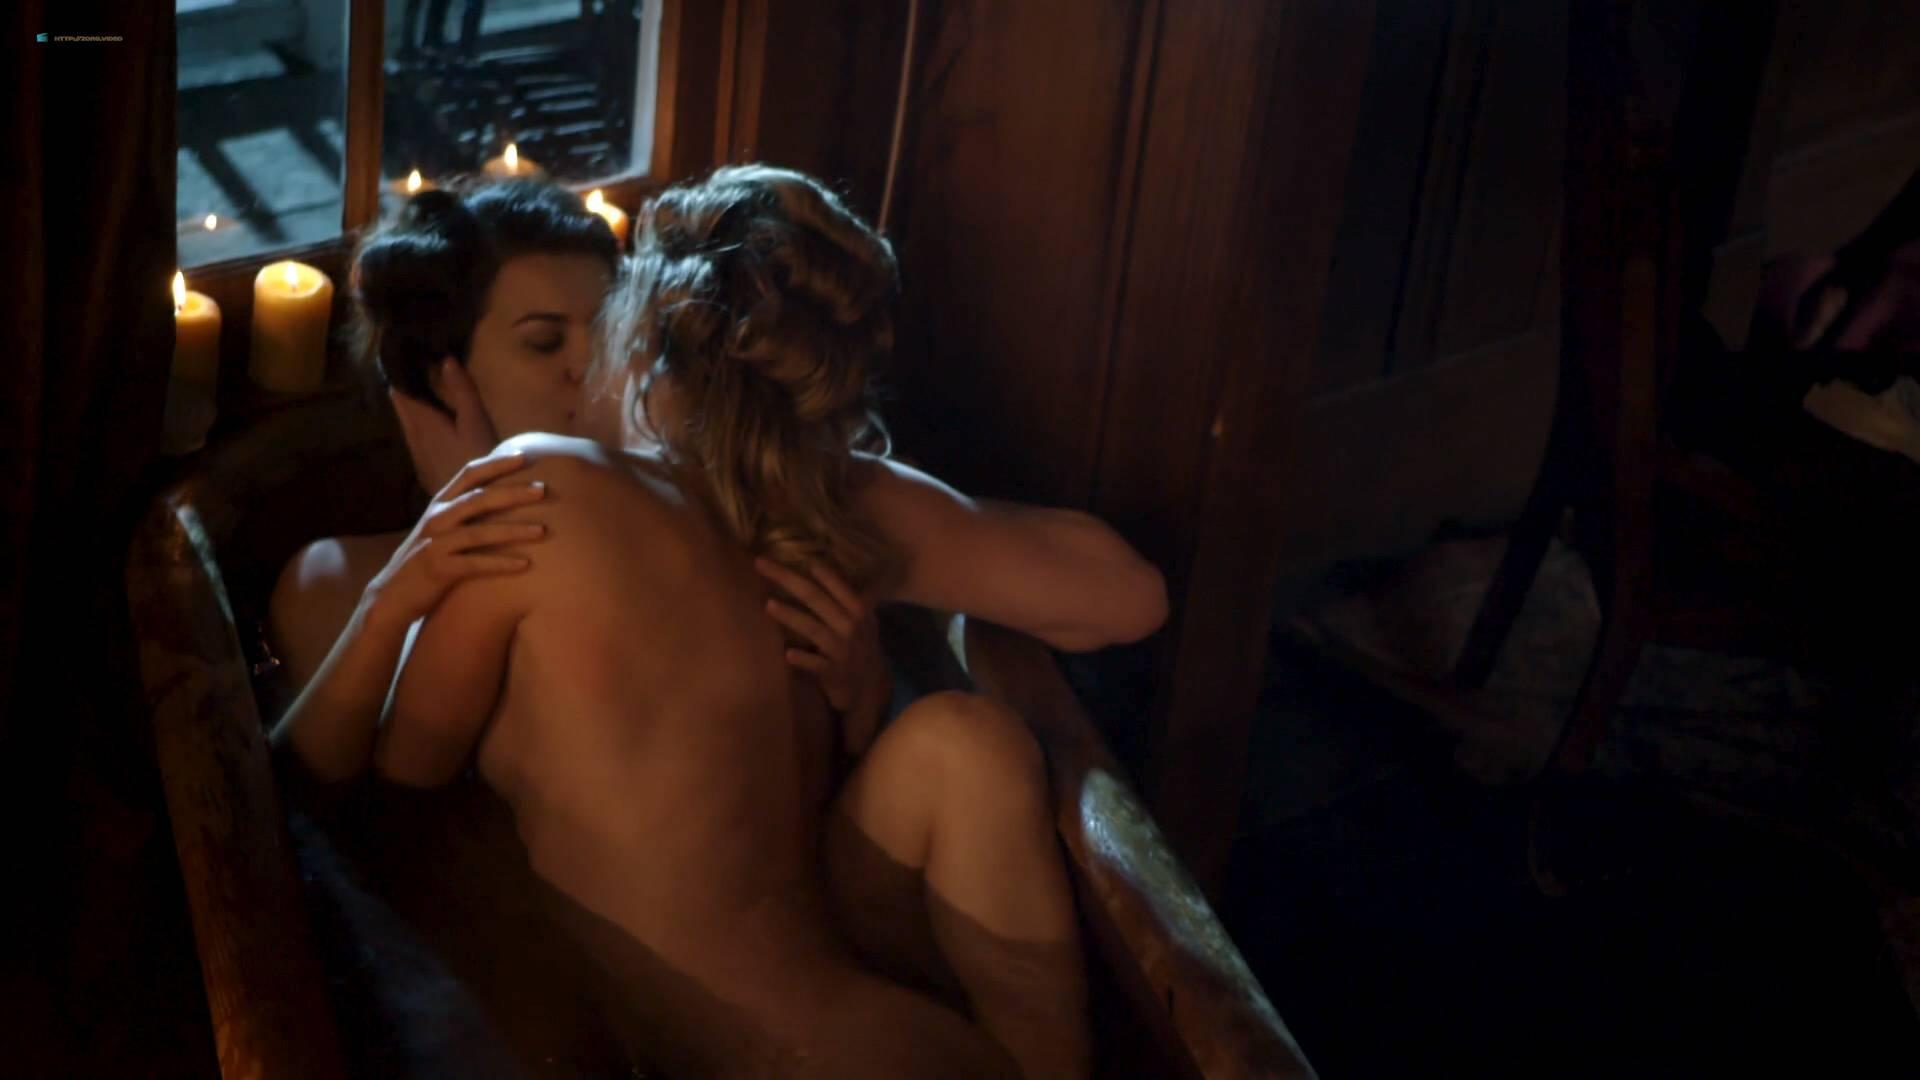 Elizabeth-Lavender-nude-topless-Elysia-Rotaru-nude-butt-boobs-Dead-Again-in-Tombstone-2017-HD-1080p-BluRay-10.jpg